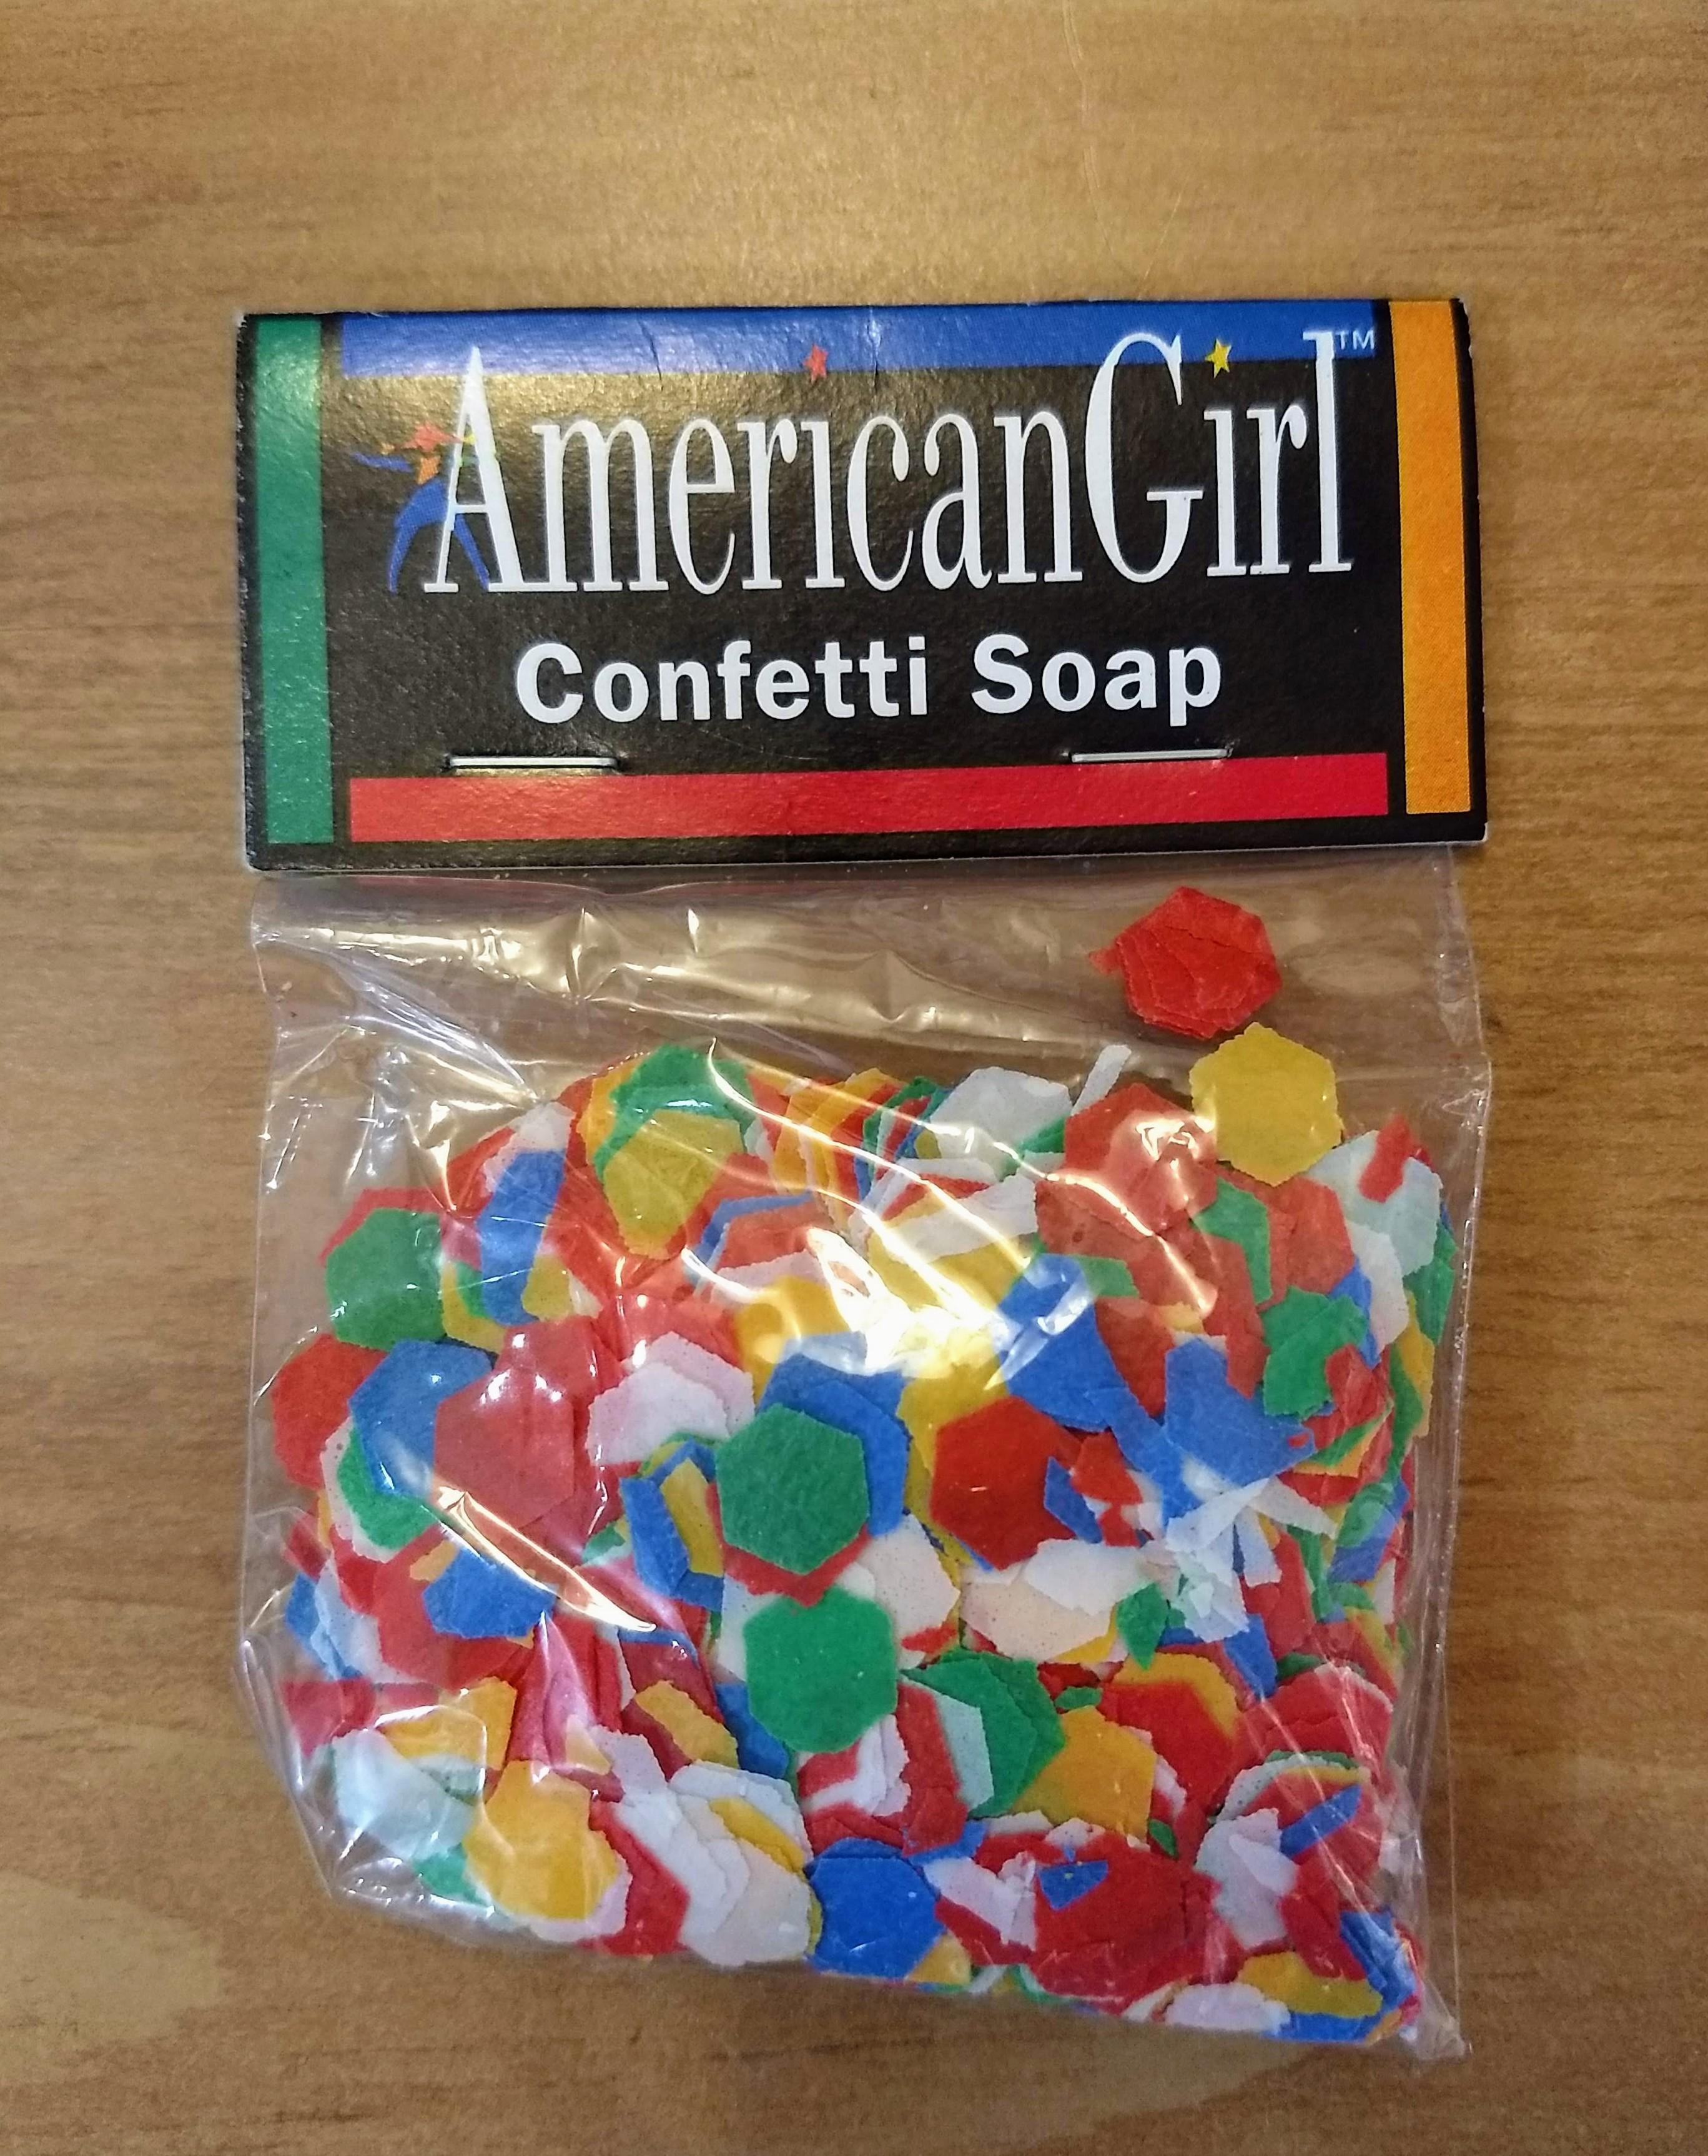 Slumber Party Kit Confetti Soap.jpg